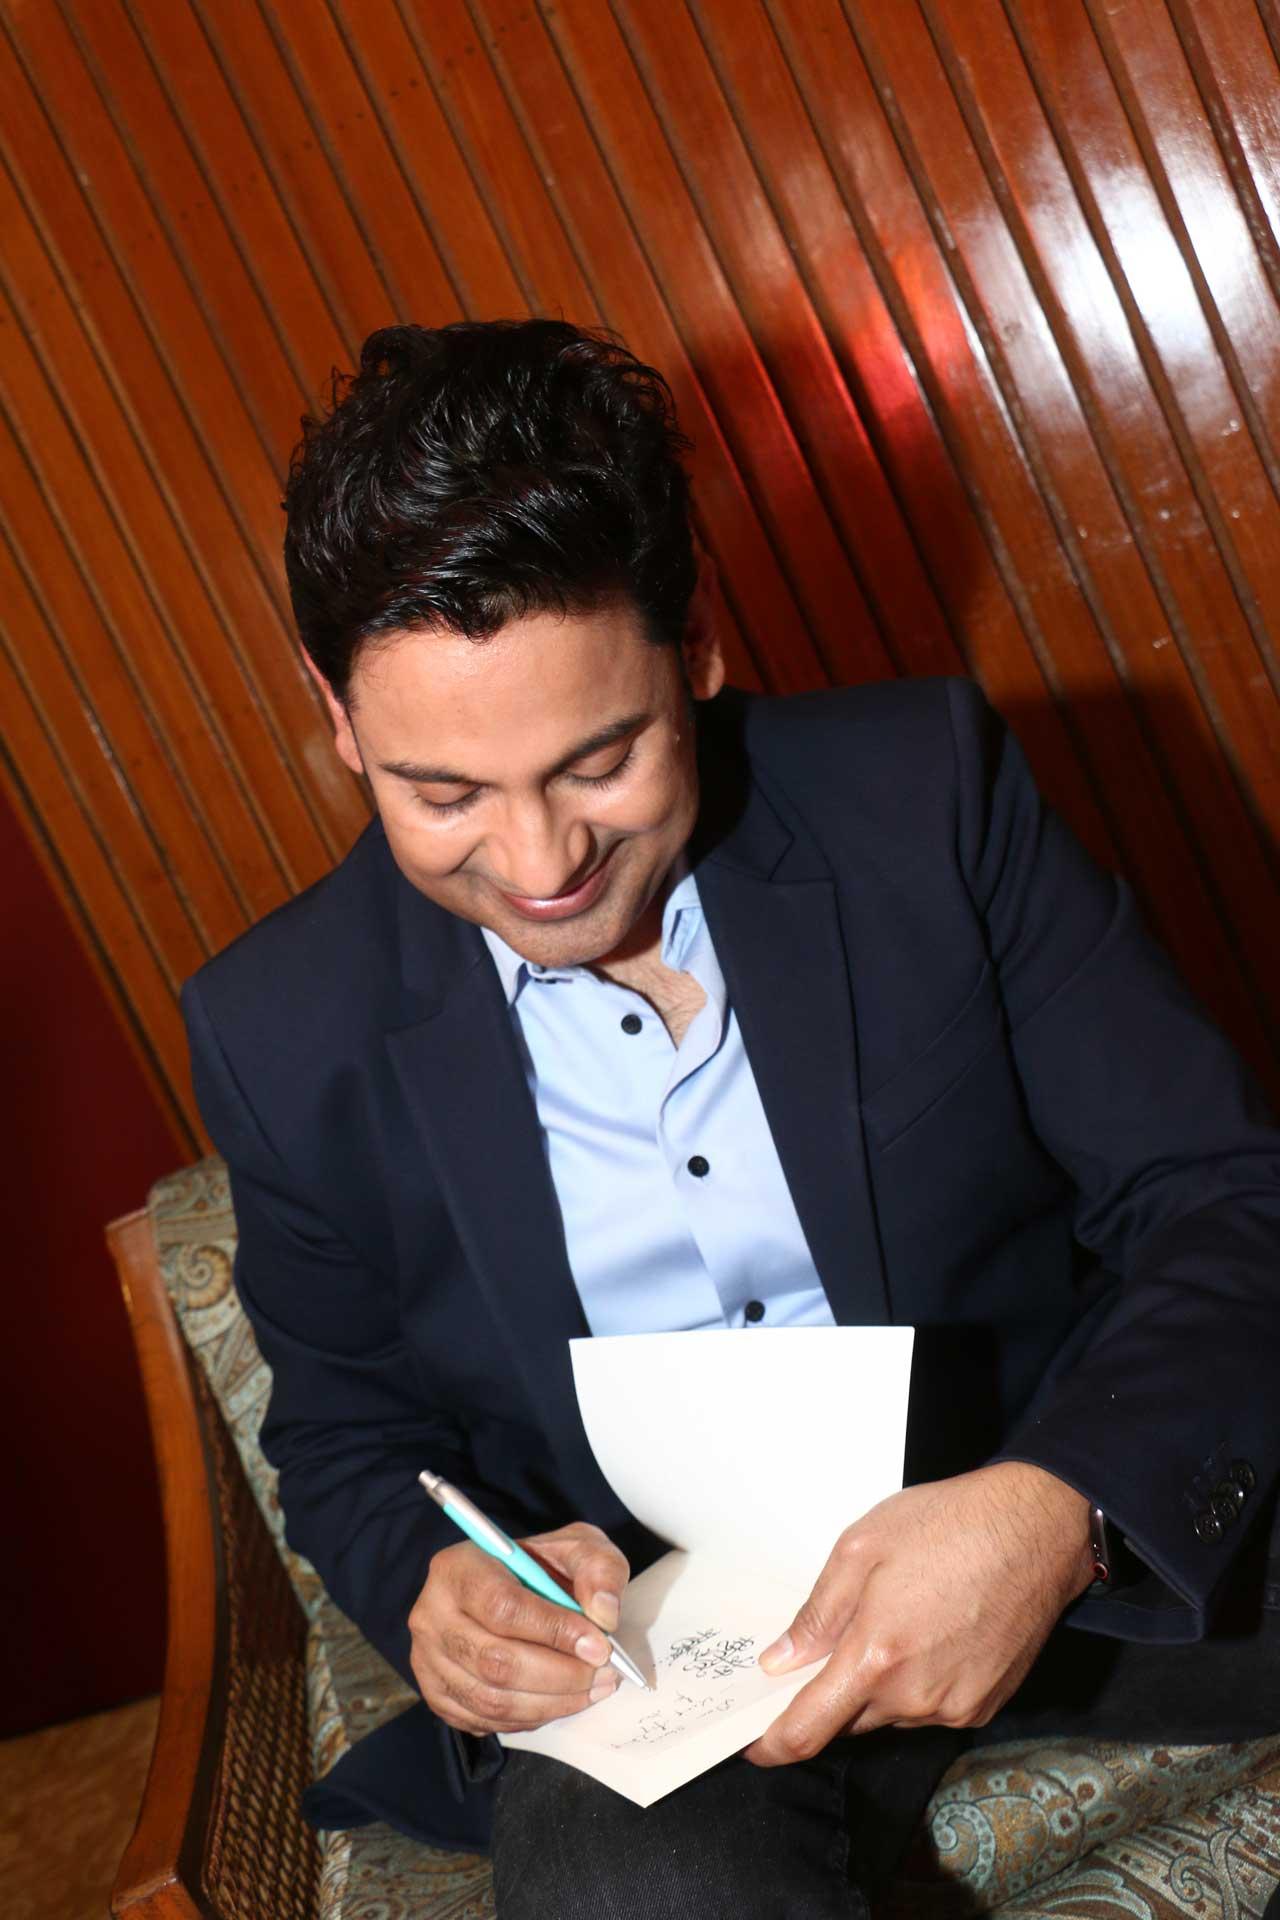 Manoj-Muntashir-signing-books-for-the-audience